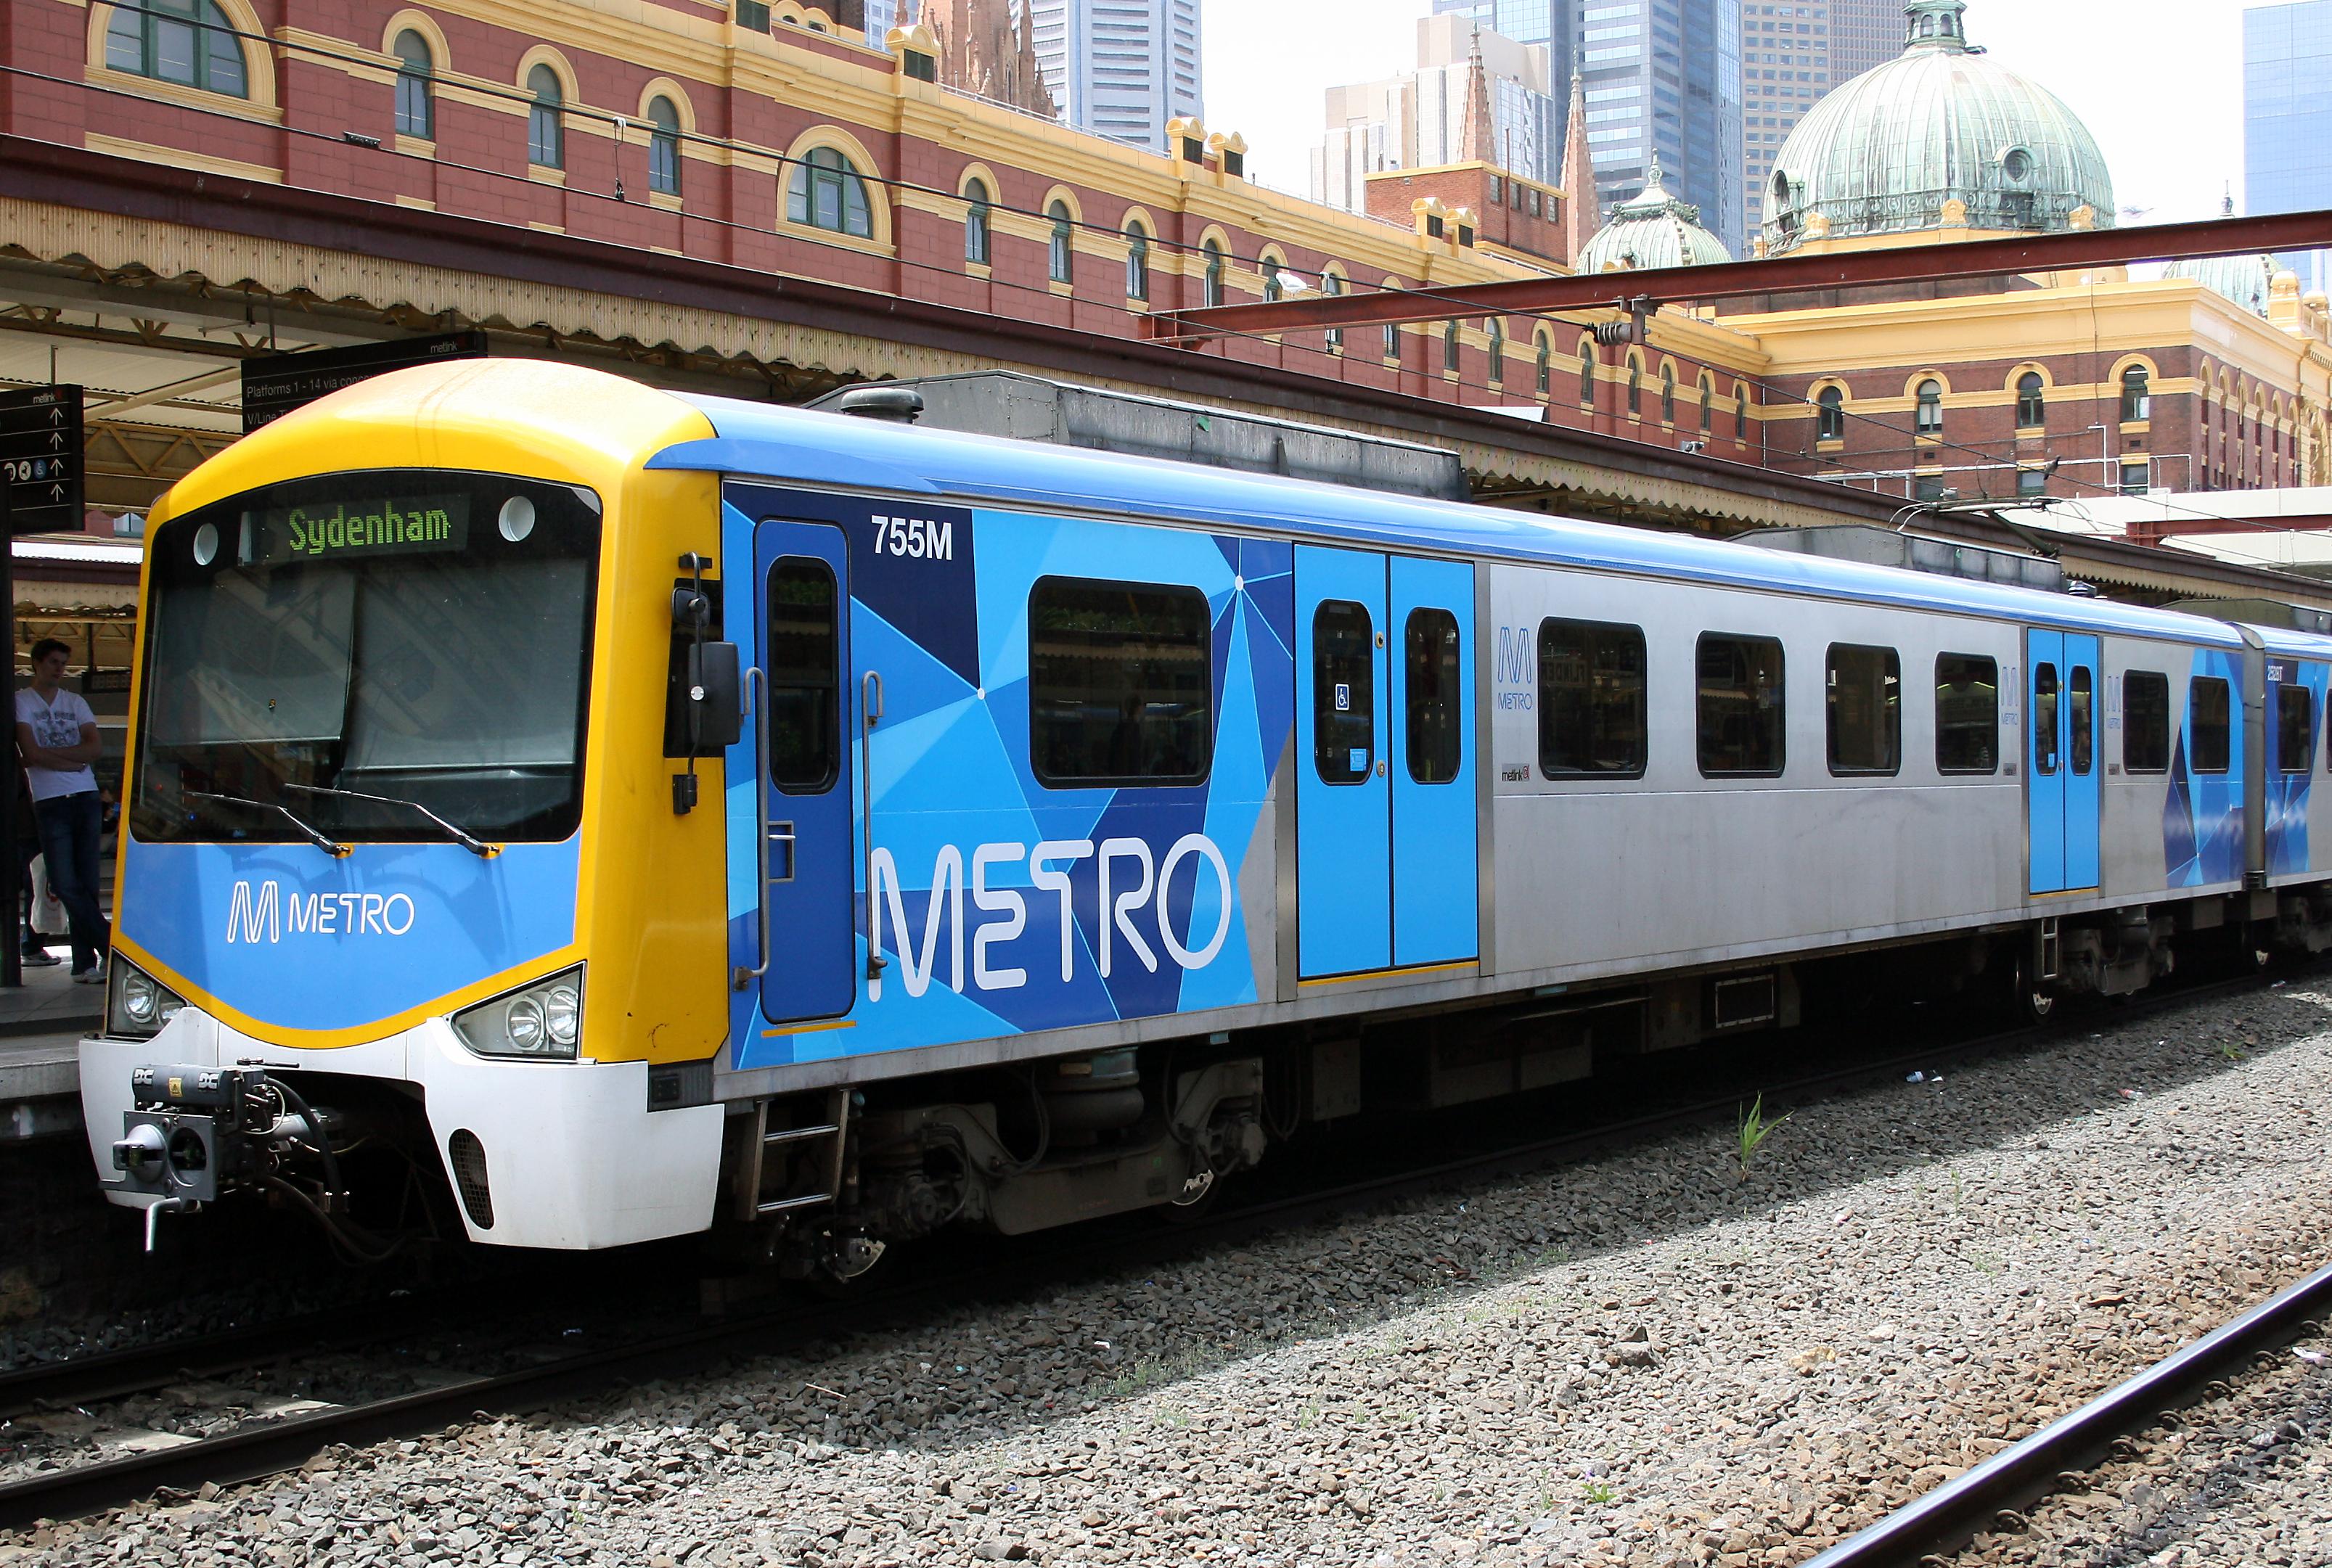 Siemens_train_in_Metro_Trains_Melbourne_Livery.jpg